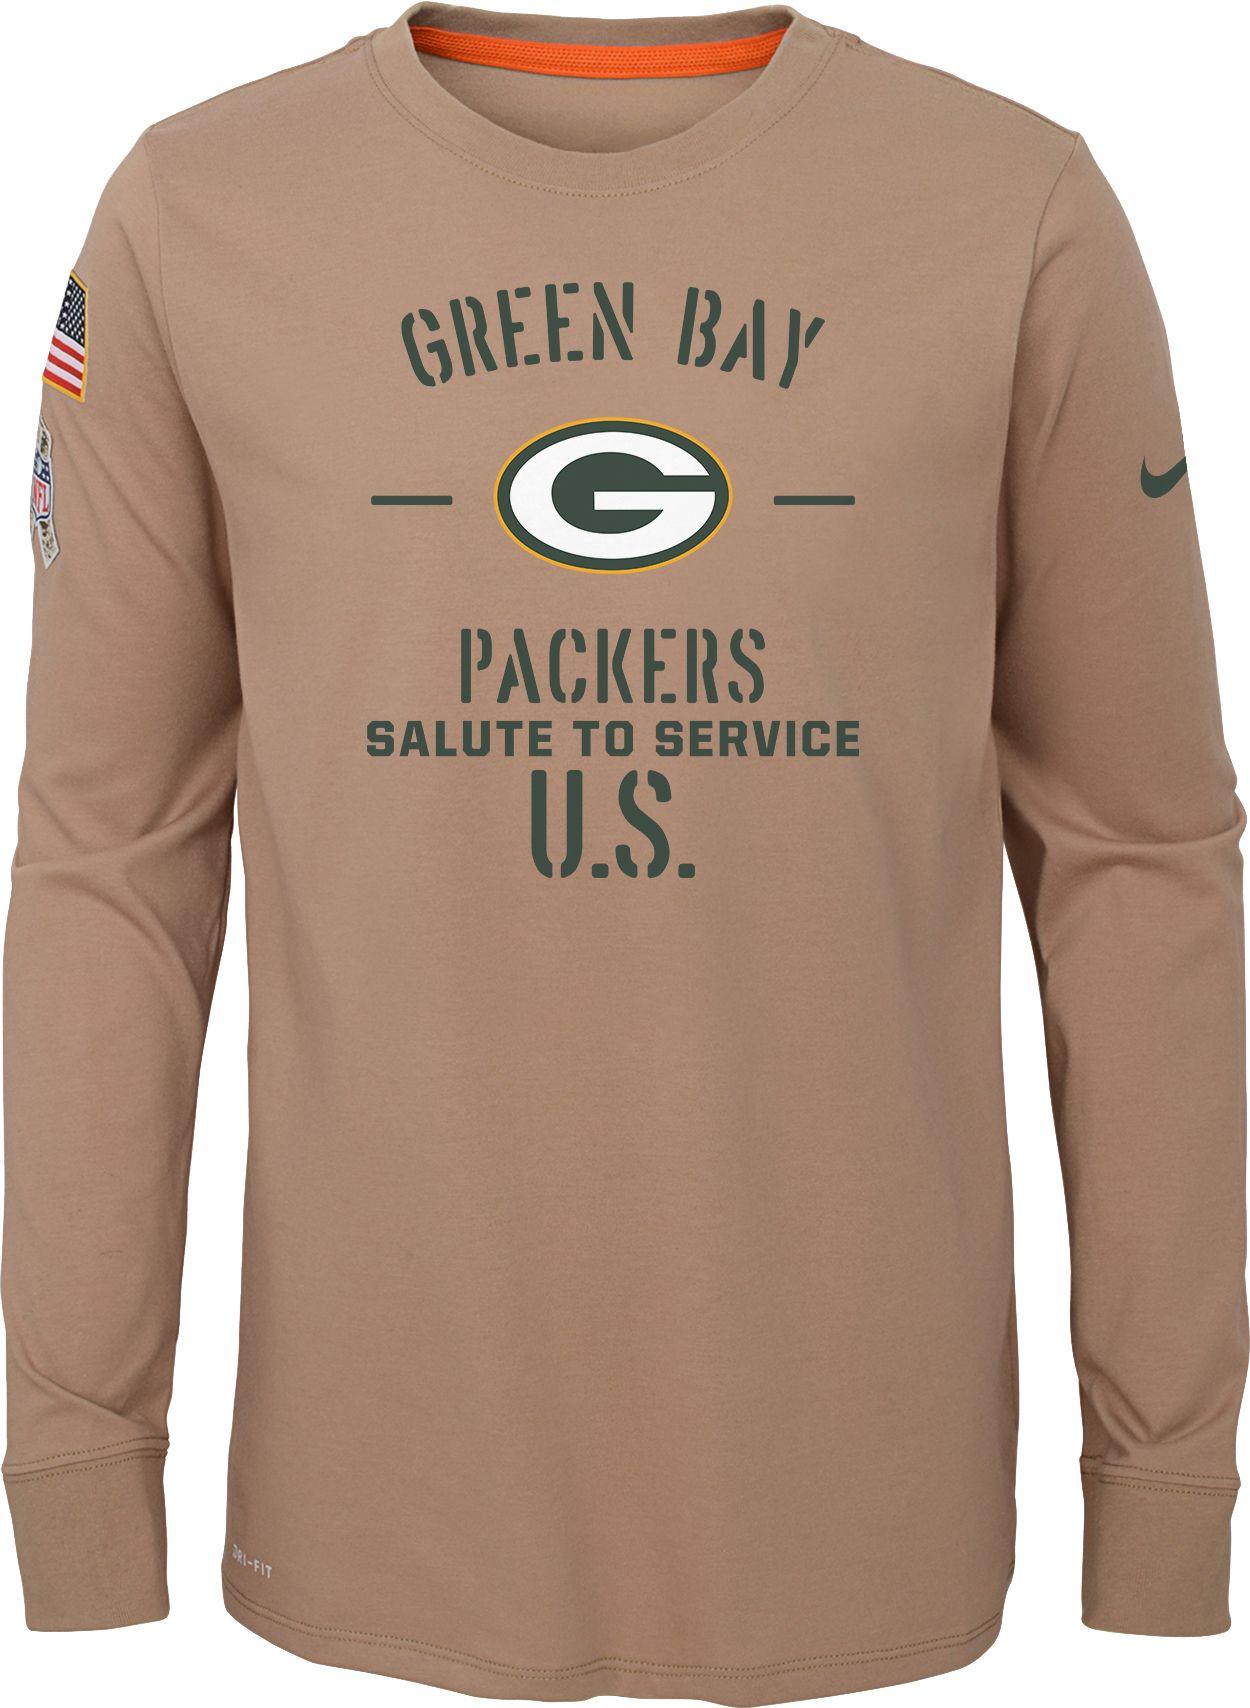 packers salute to service sweatshirt